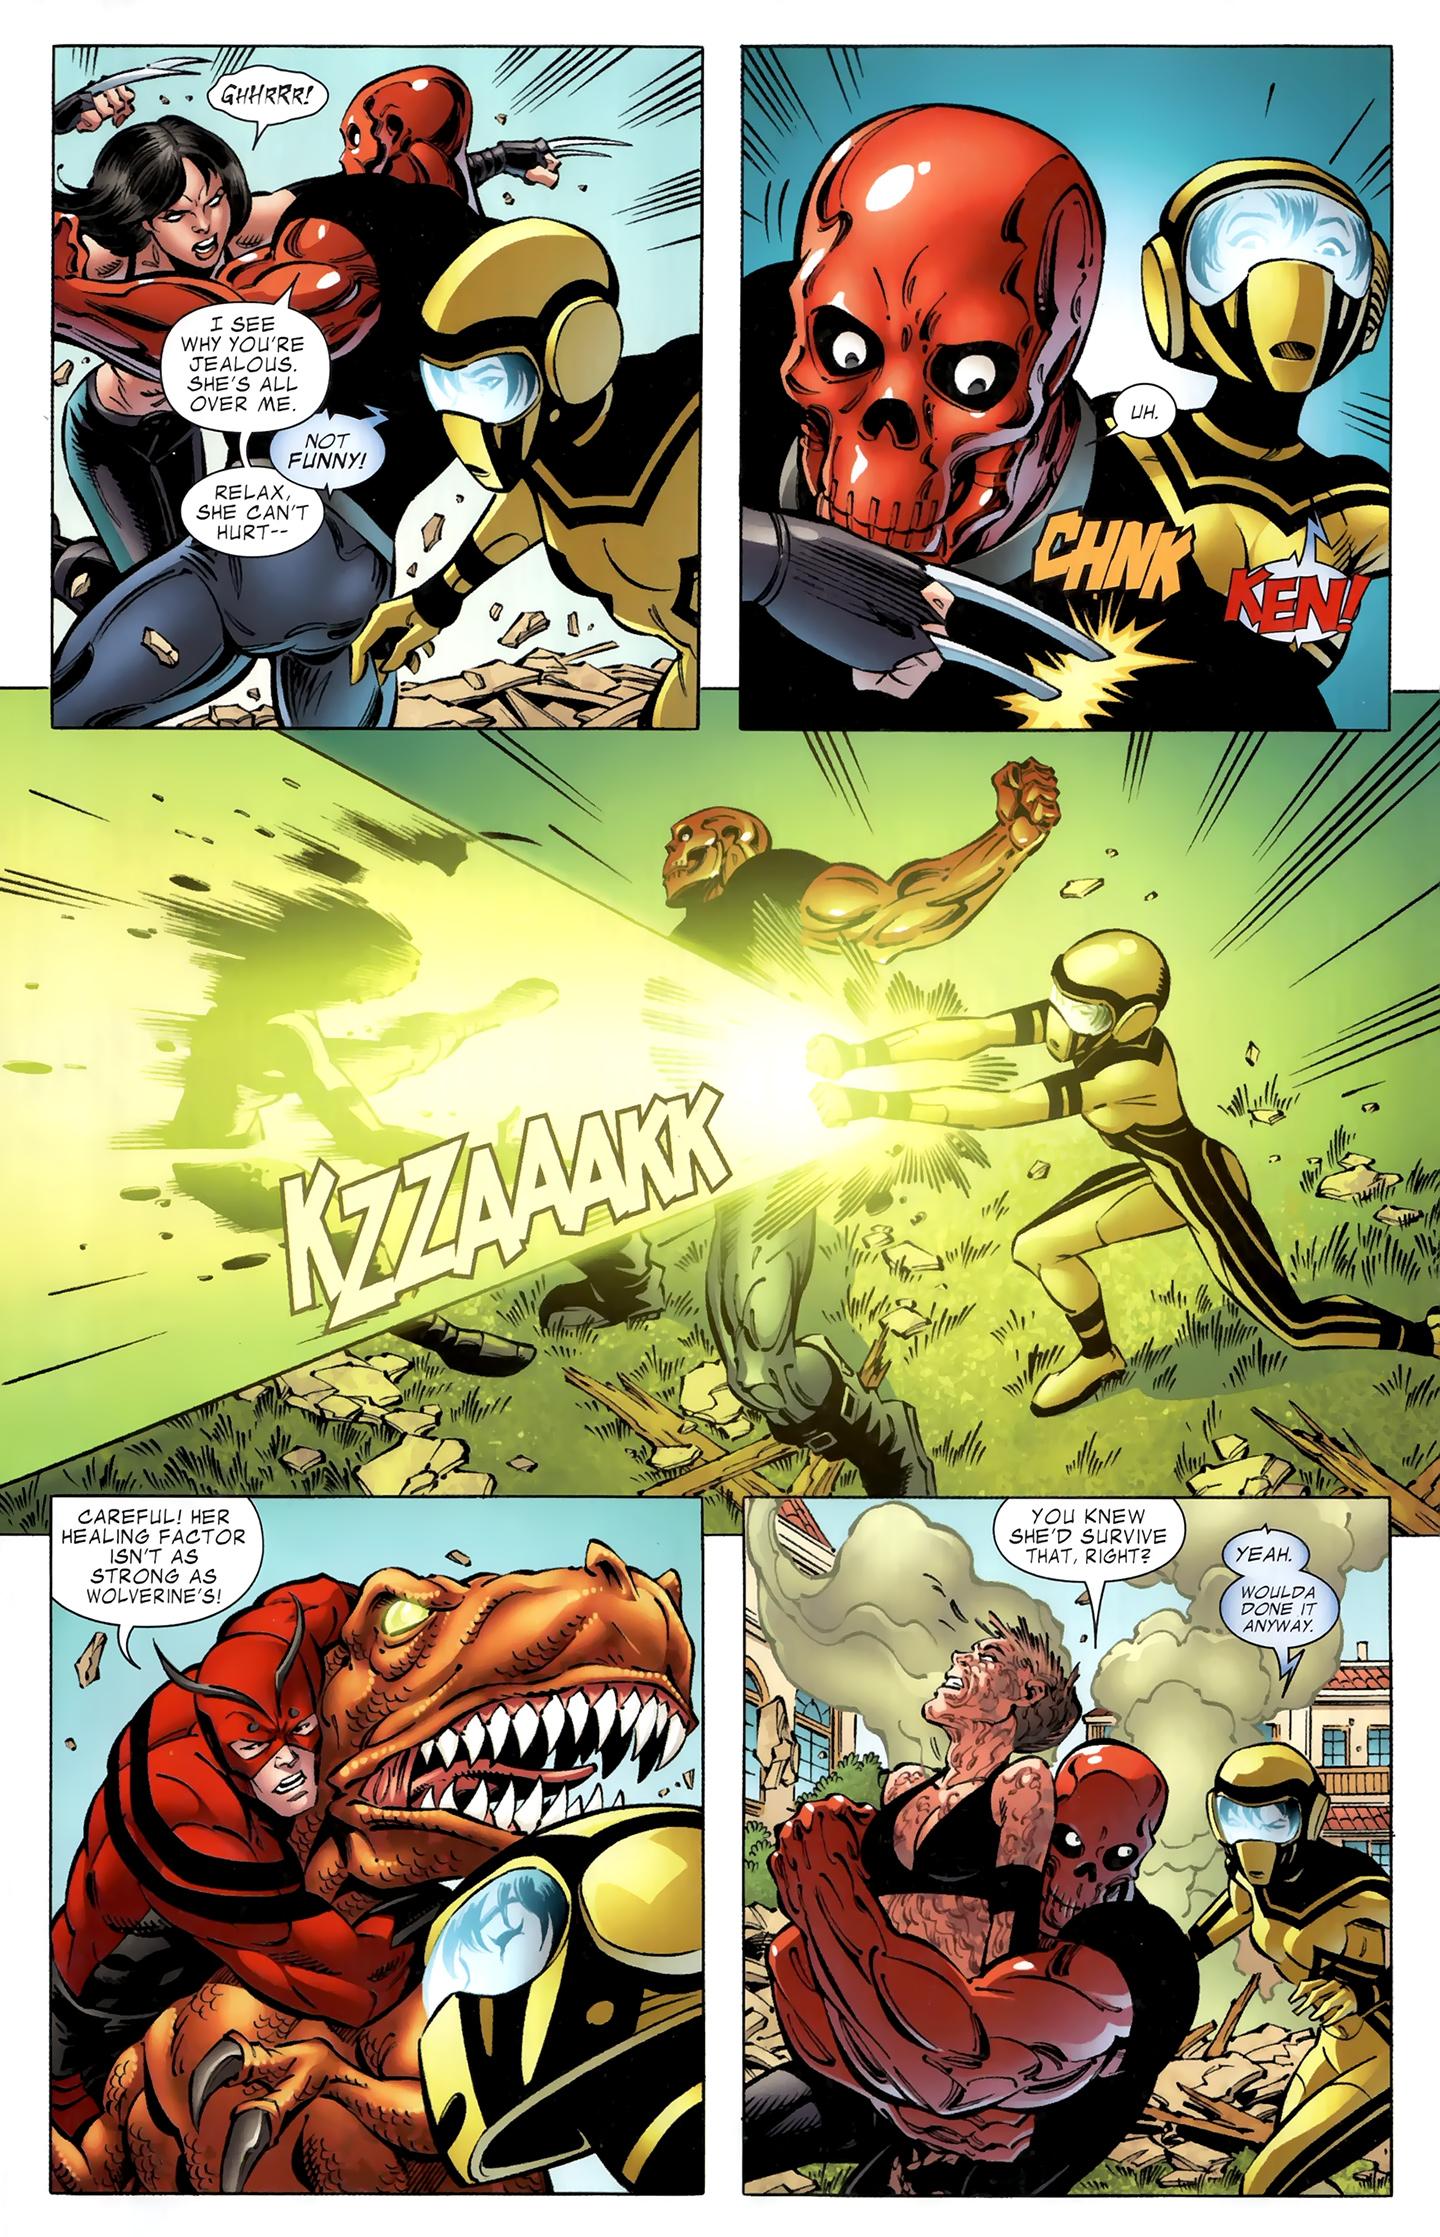 Marvel avengers academy dating